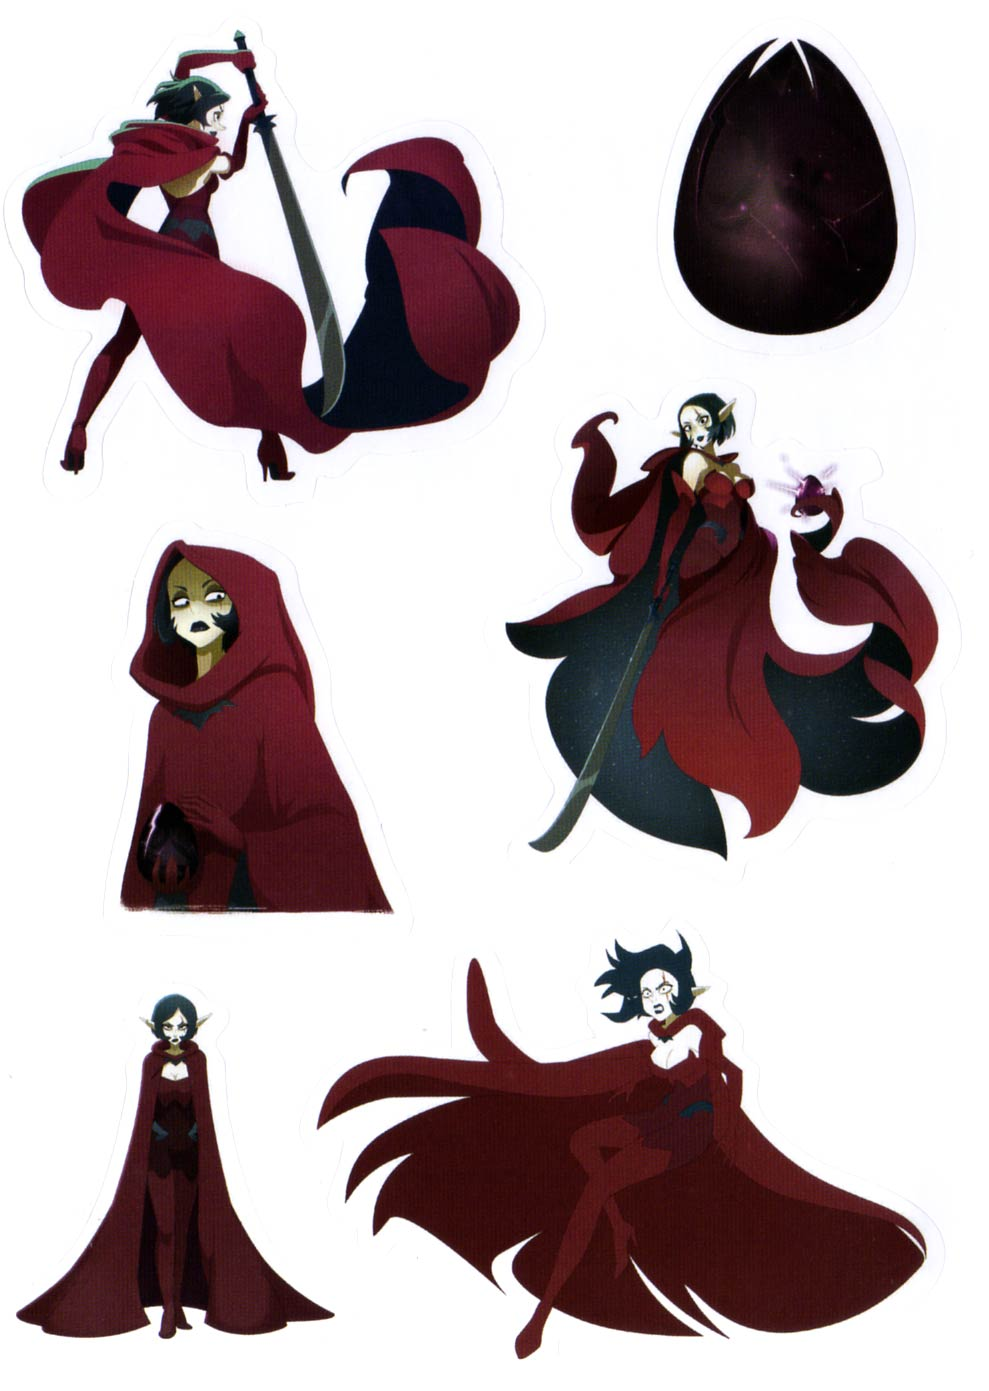 https://cosplayfu-website.s3.amazonaws.com/_Upload/b/34491-Julith-Cosplay-from-Dofus.jpg